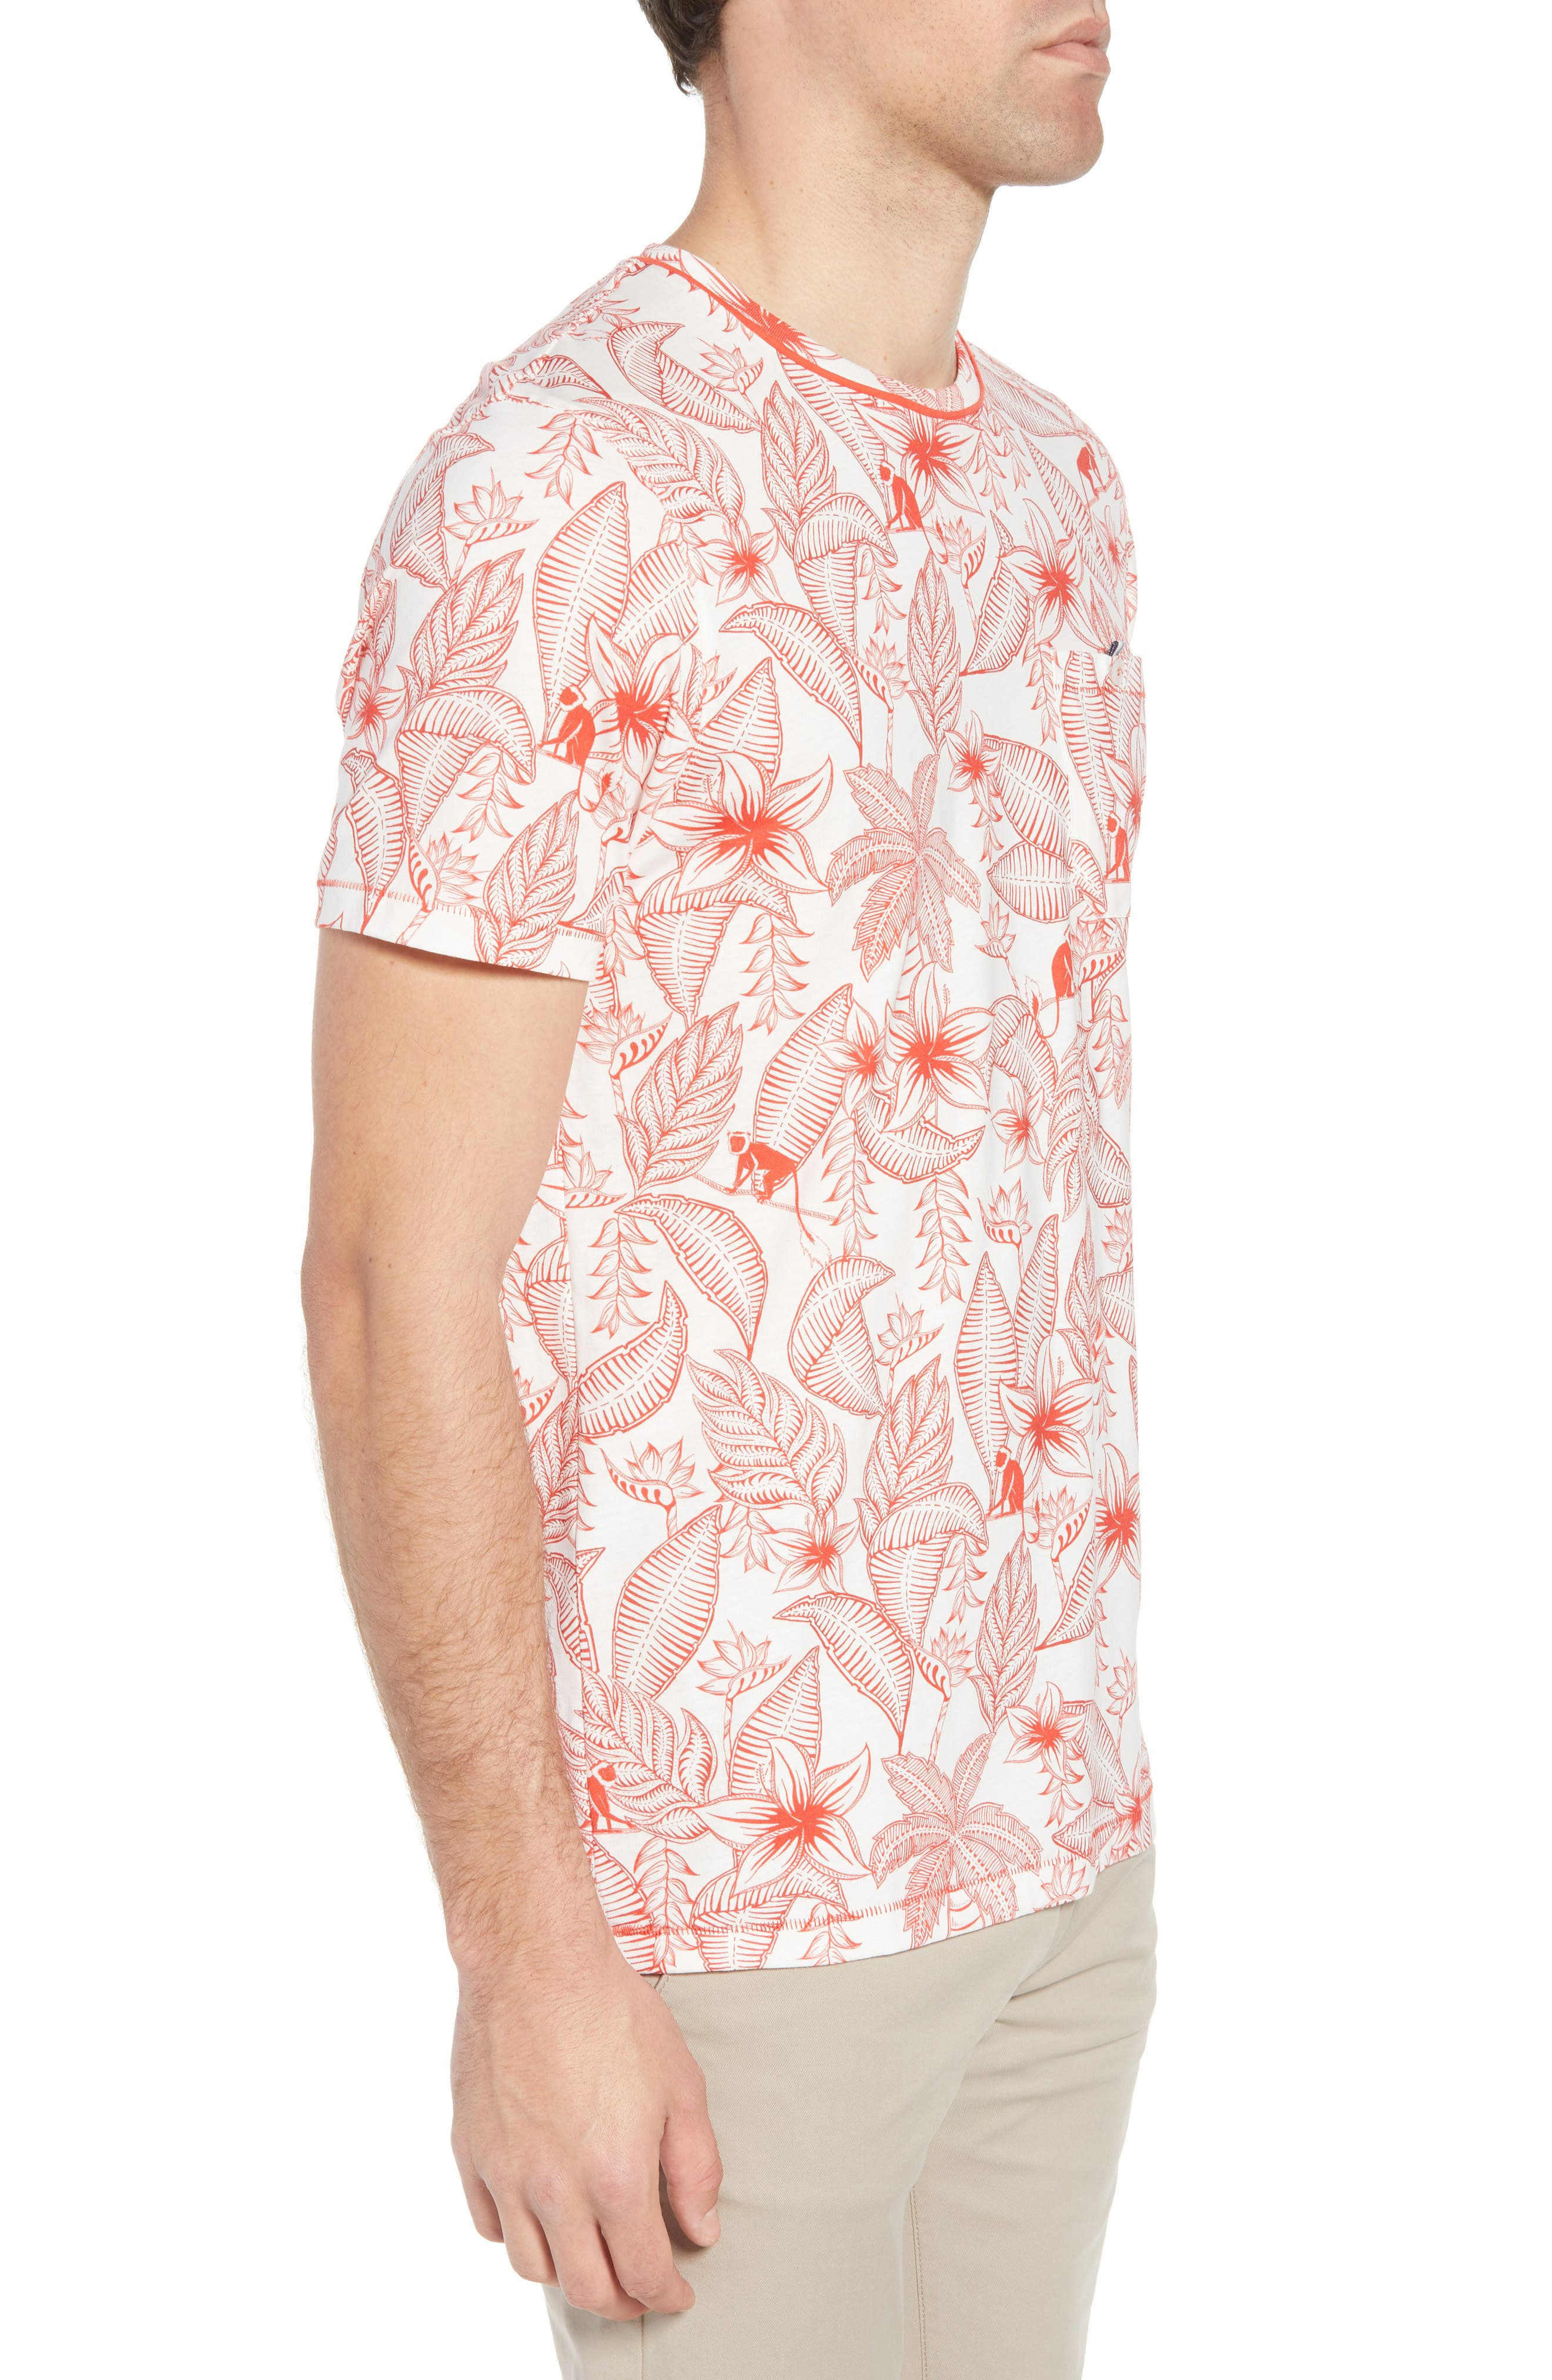 Bengel Crewneck T-Shirt,                             Alternate thumbnail 3, color,                             Red